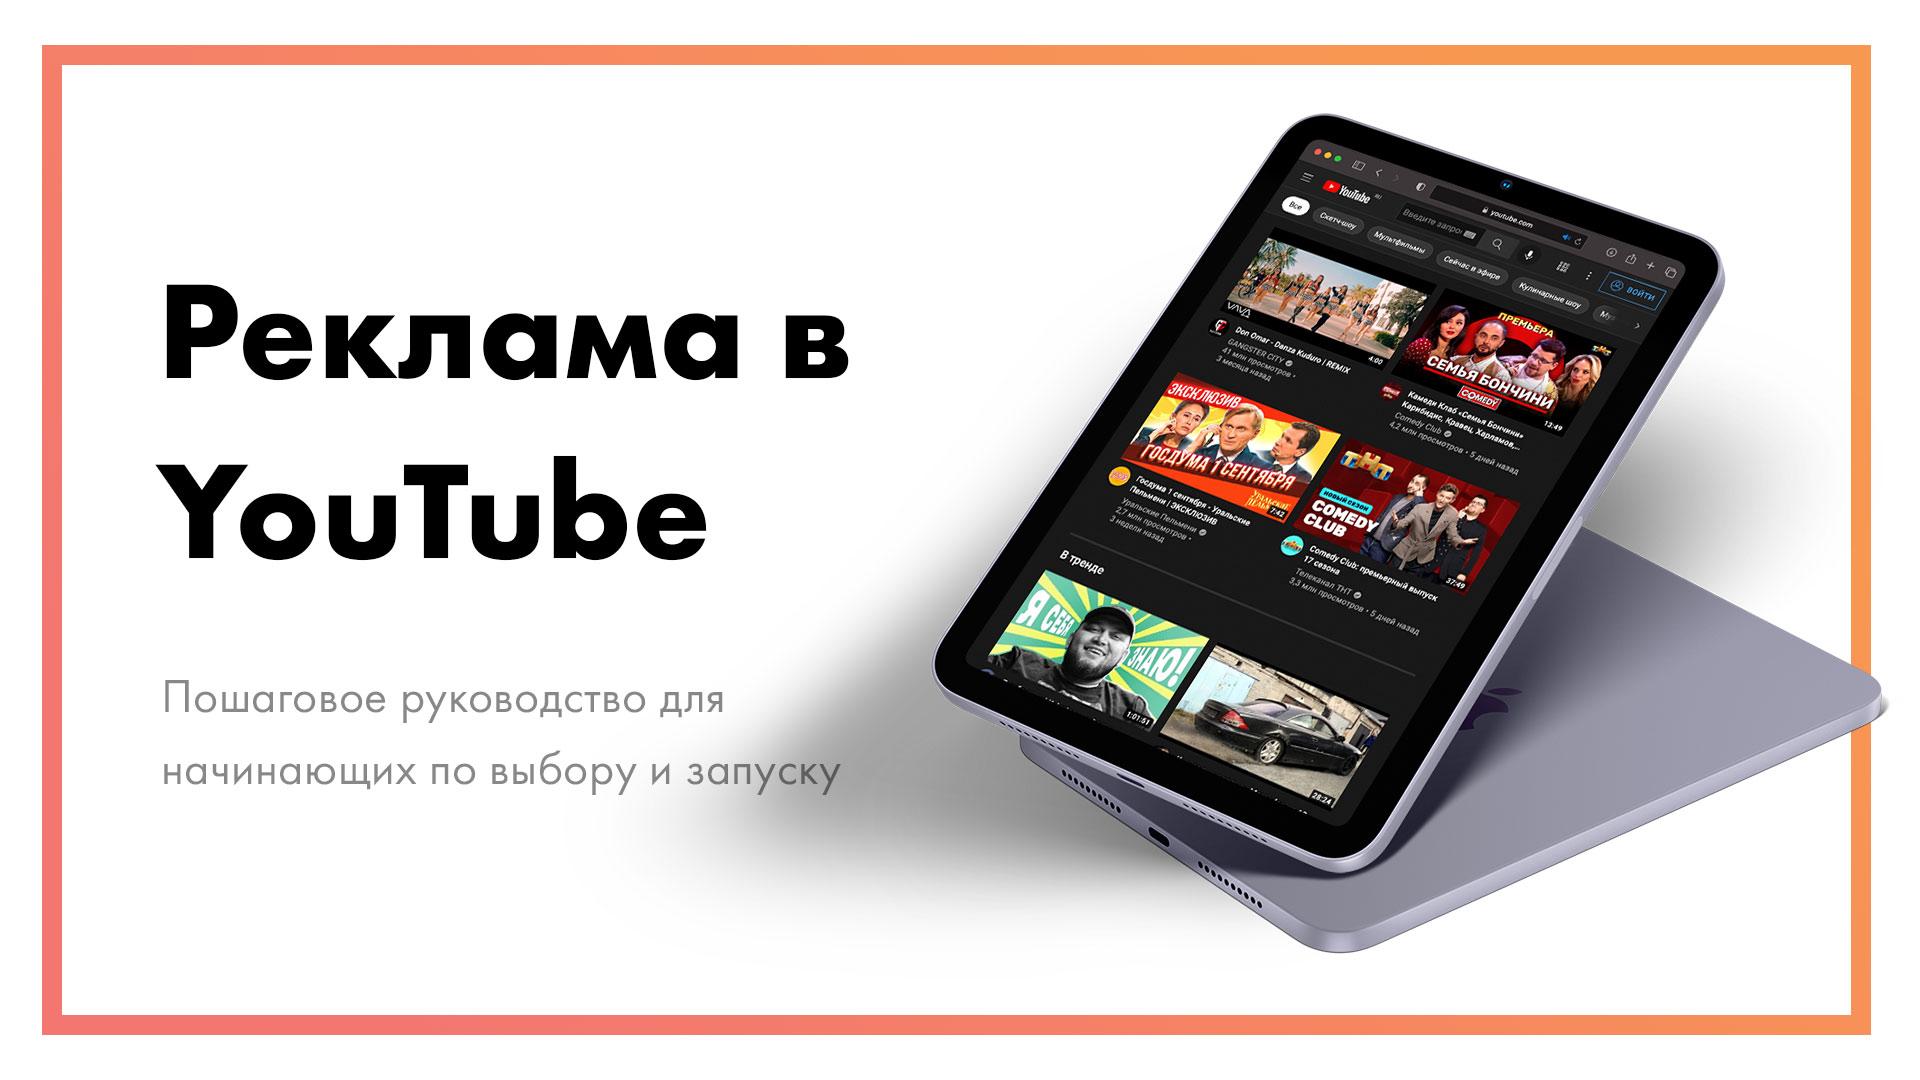 Реклама-в-Youtube-–-пошаговое-руководство-для-начинающих-[7-шагов].jpg